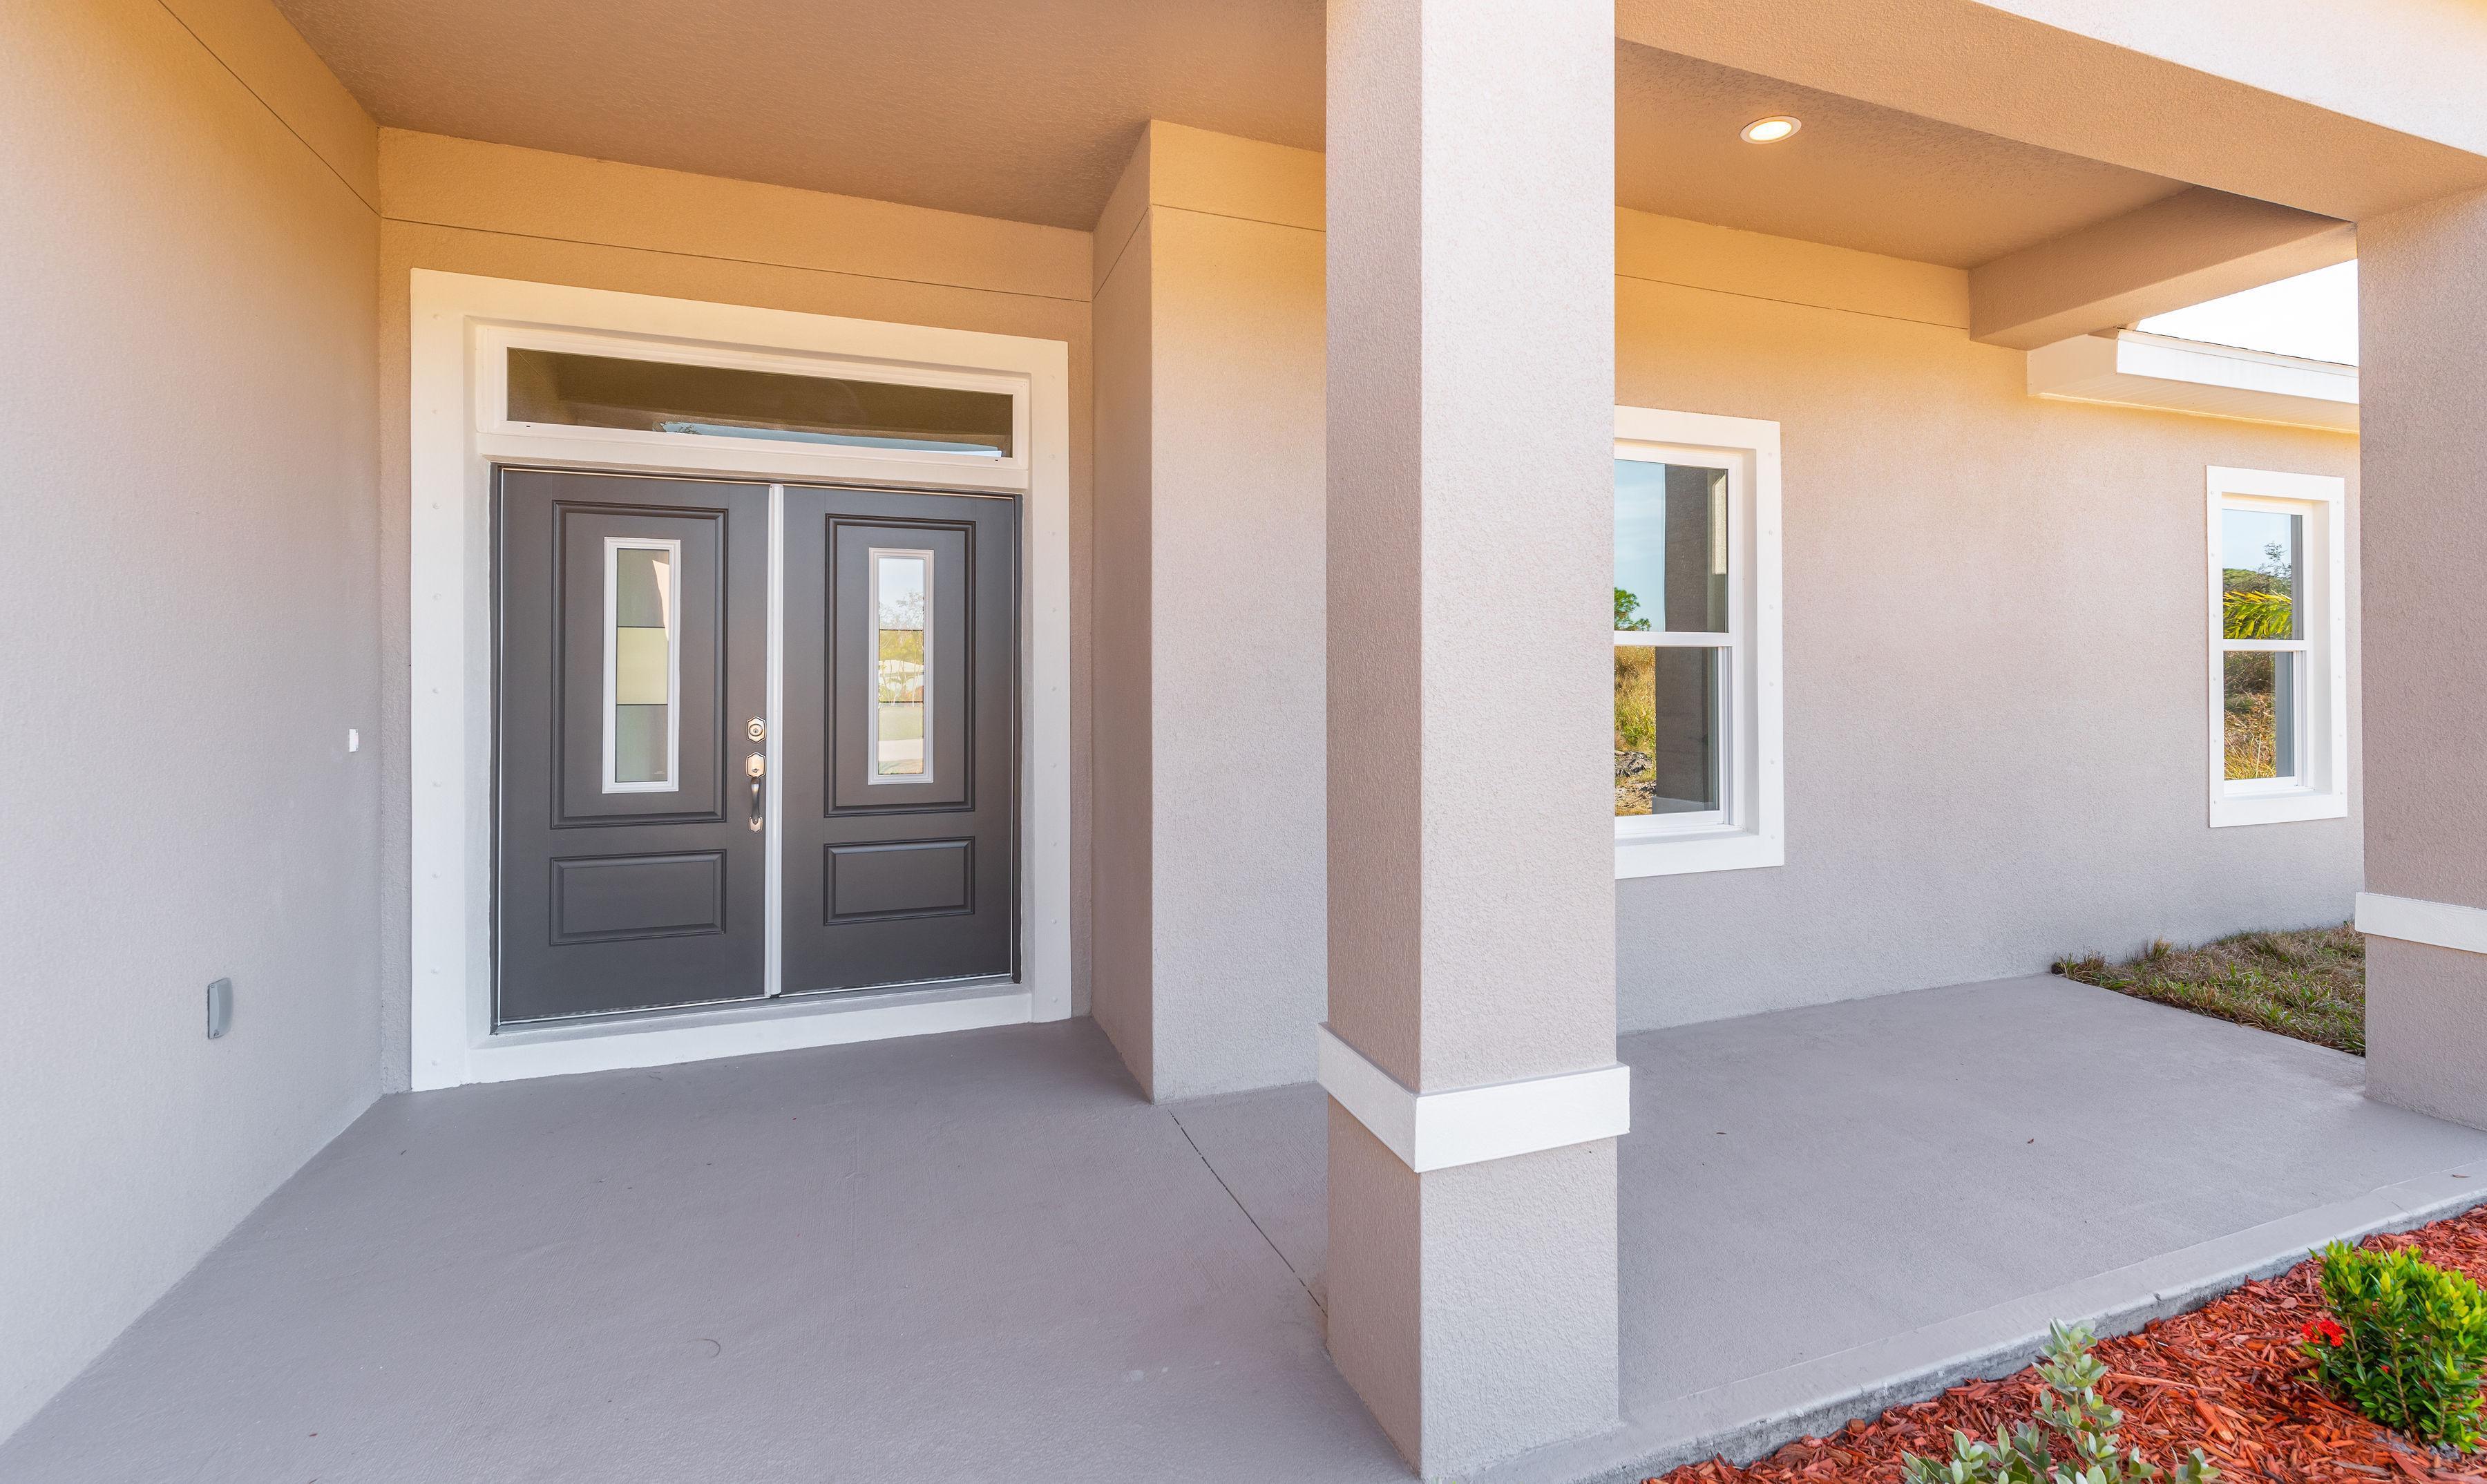 Exterior featured in the Villa Porto (2-car) By Palladio Homes in Ocala, FL